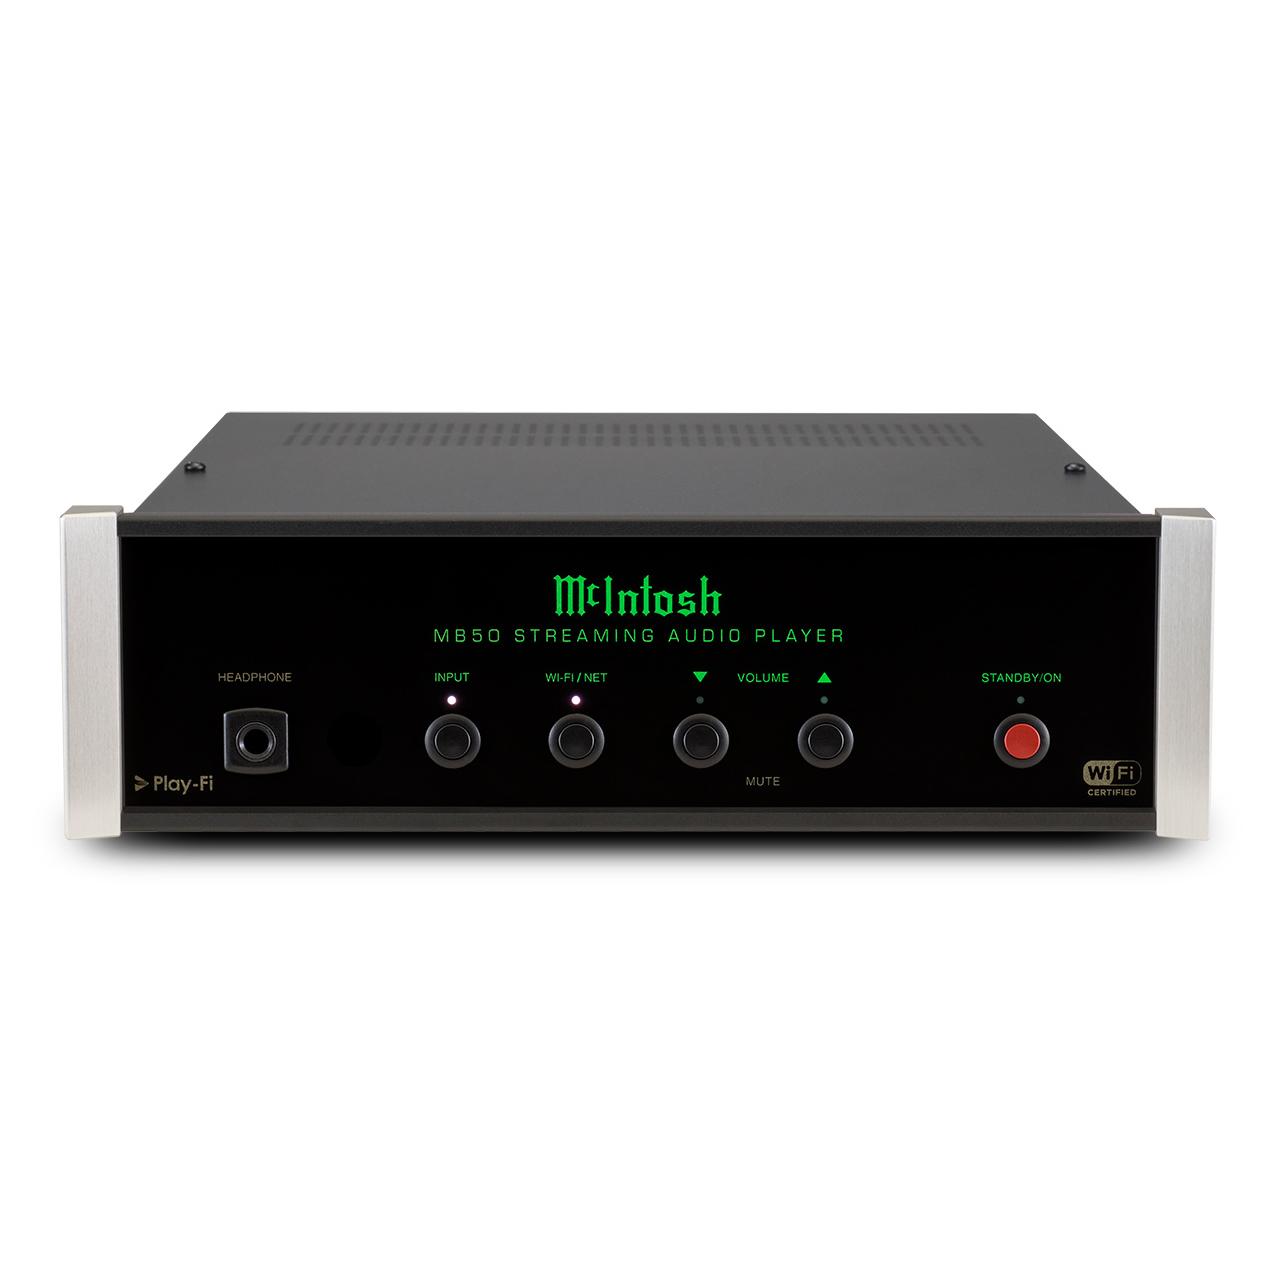 Сетевые аудио проигрыватели McIntosh, арт: 158141 - Сетевые аудио проигрыватели